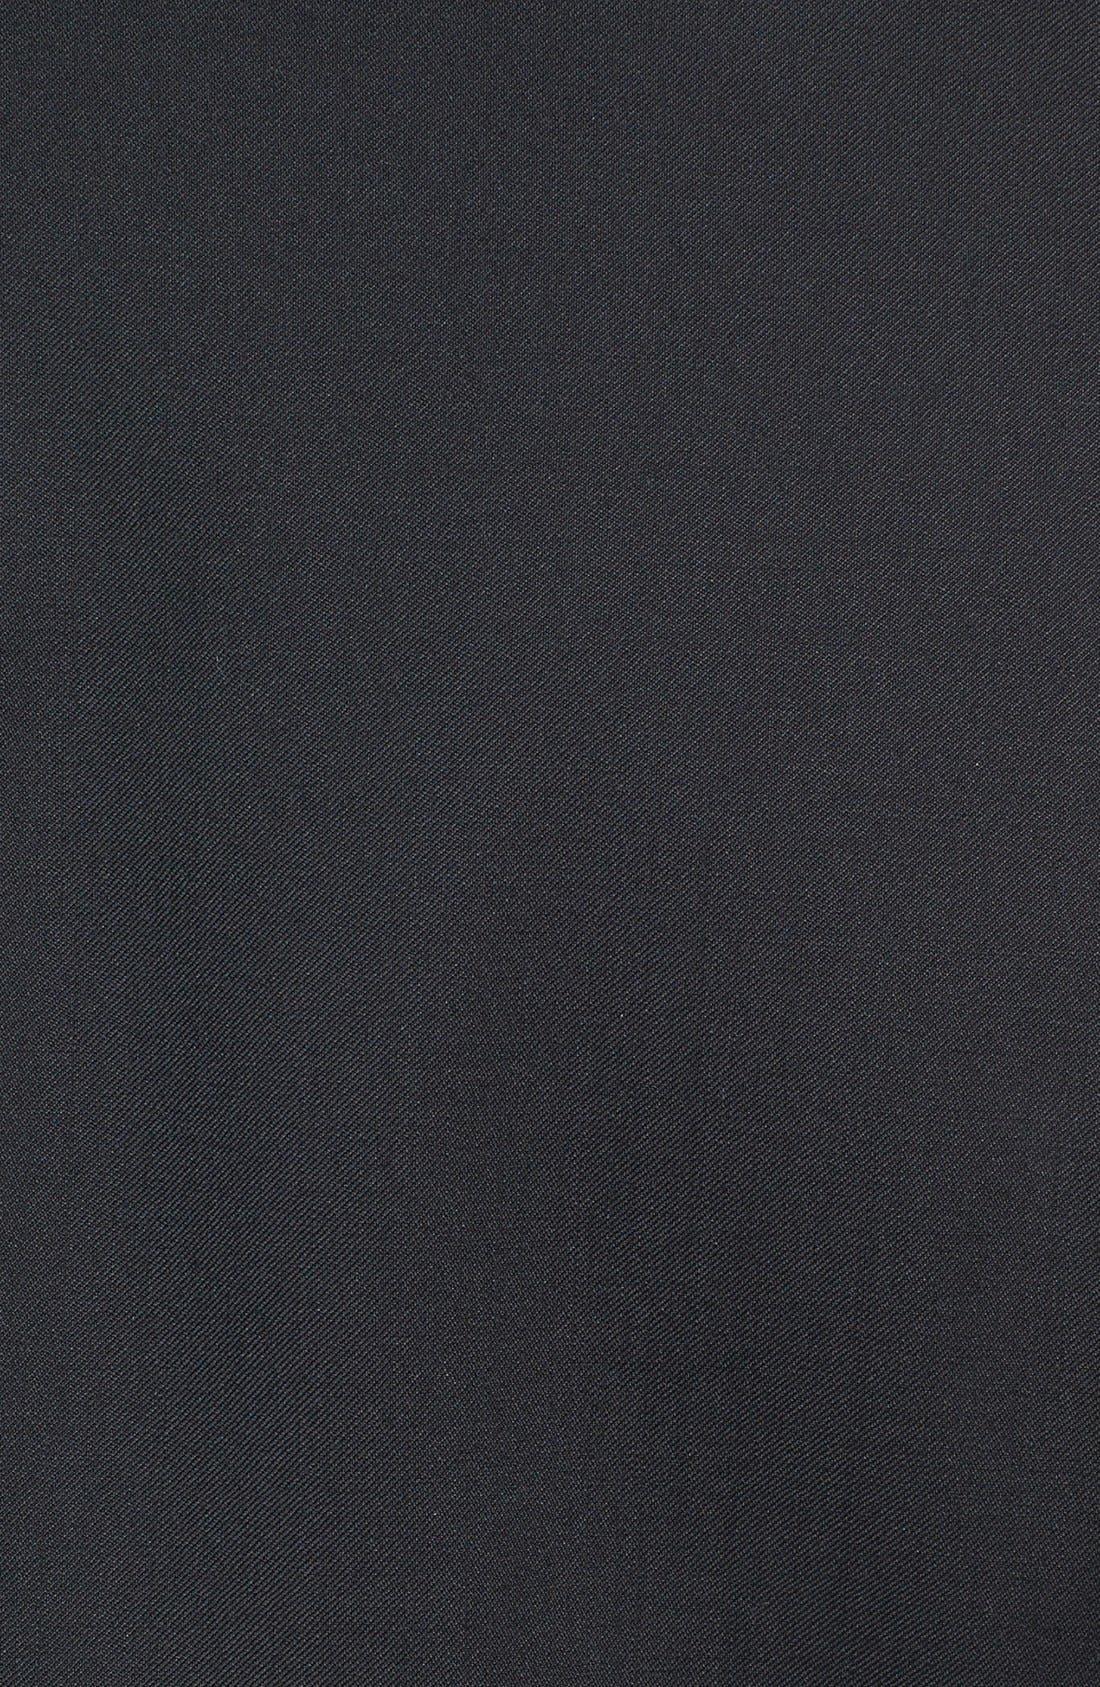 THEORY,                             'Wellar PE Hamburg' Tuxedo Jacket,                             Alternate thumbnail 3, color,                             001